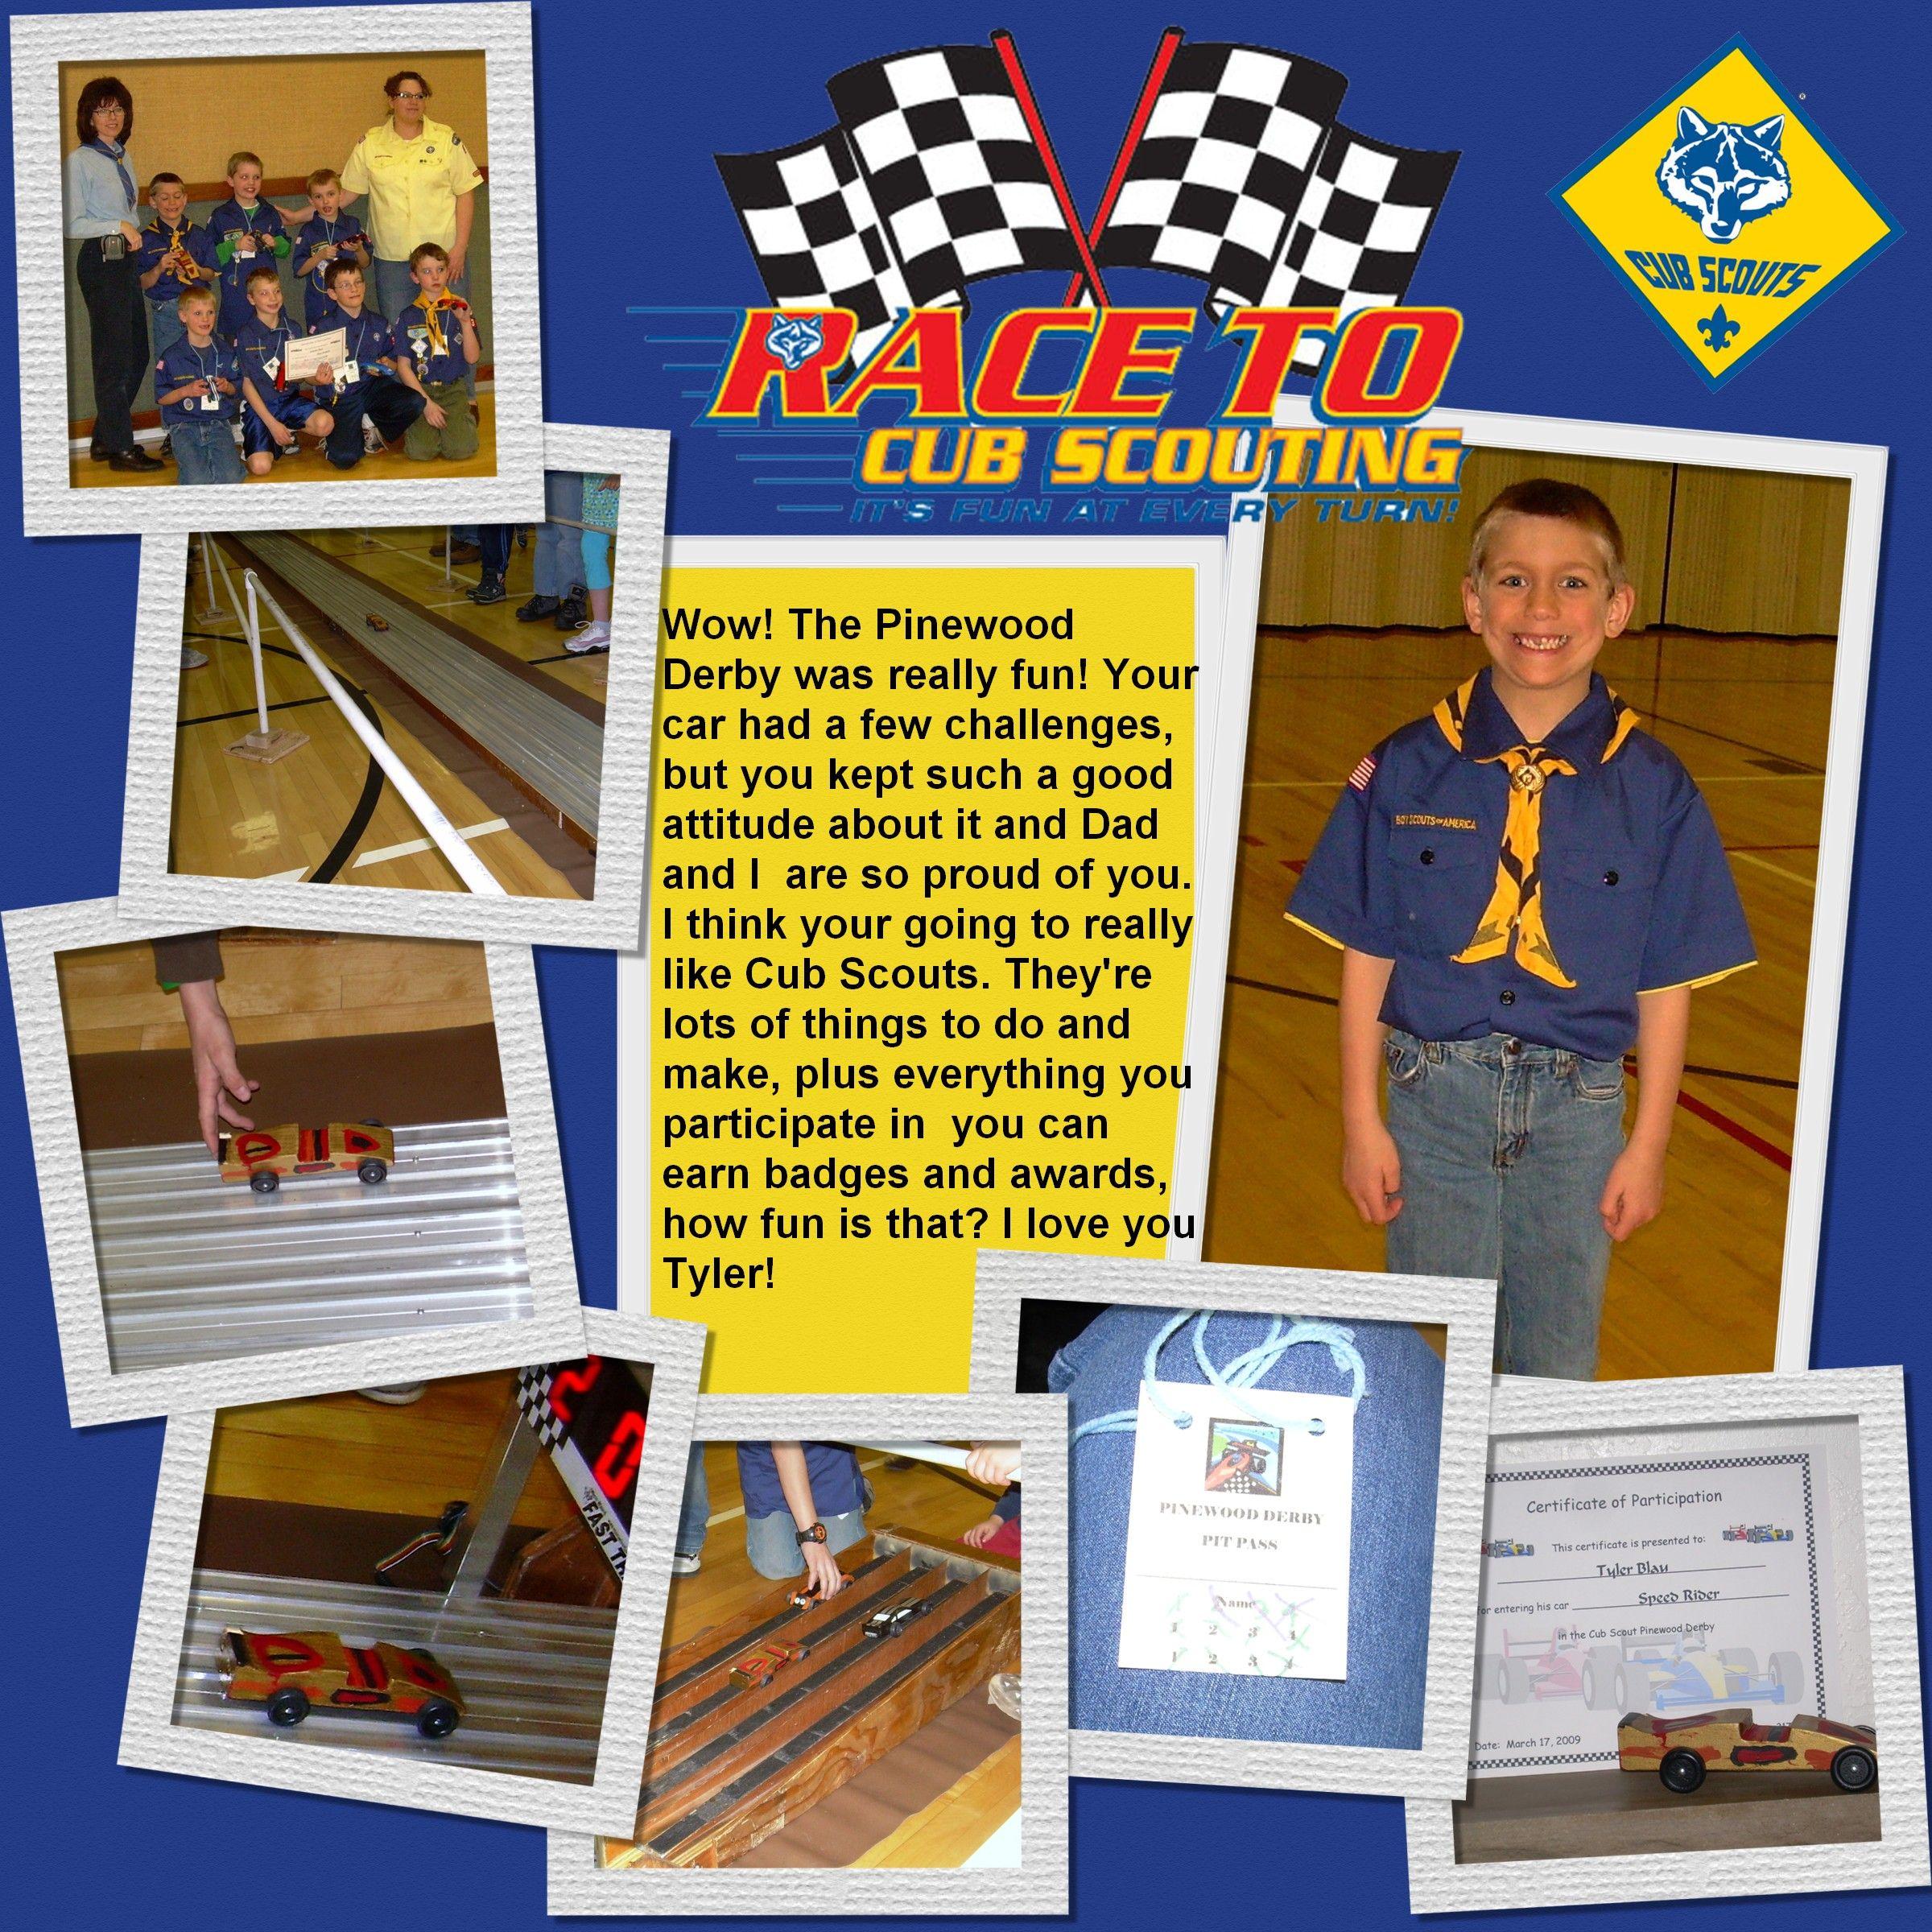 Girl scout scrapbook ideas - Boy Scout Scrapbook Page Layouts Page Scraphappens S Scrapbooks